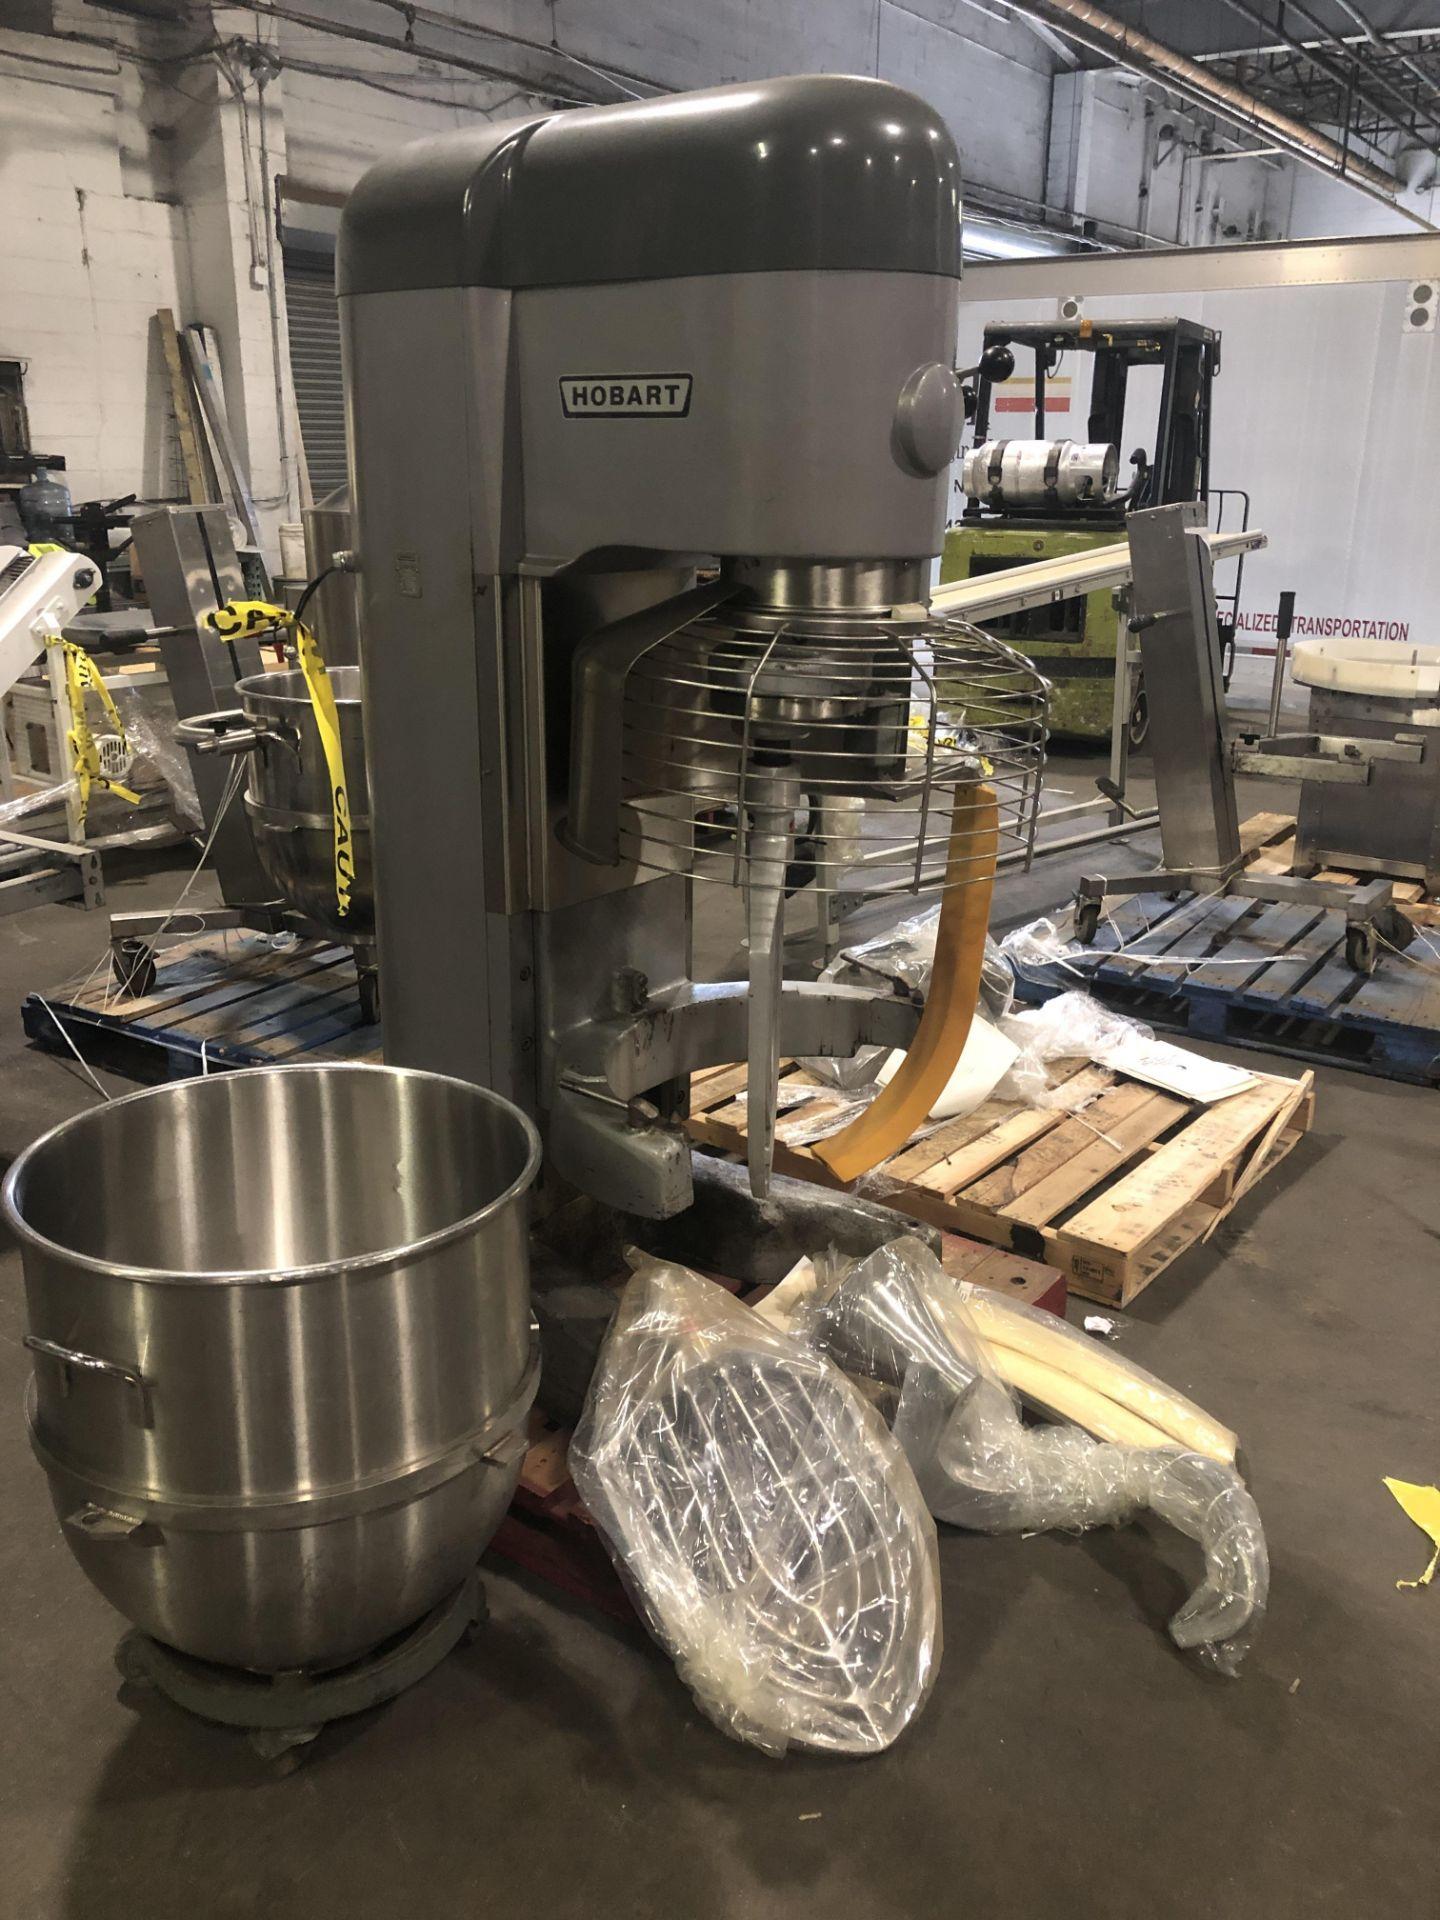 Lot 17 - Hobart model V1401 140-qt Mixer - (2) Hercules manual hydraulic bowl lifts - (2) Stainless Steel